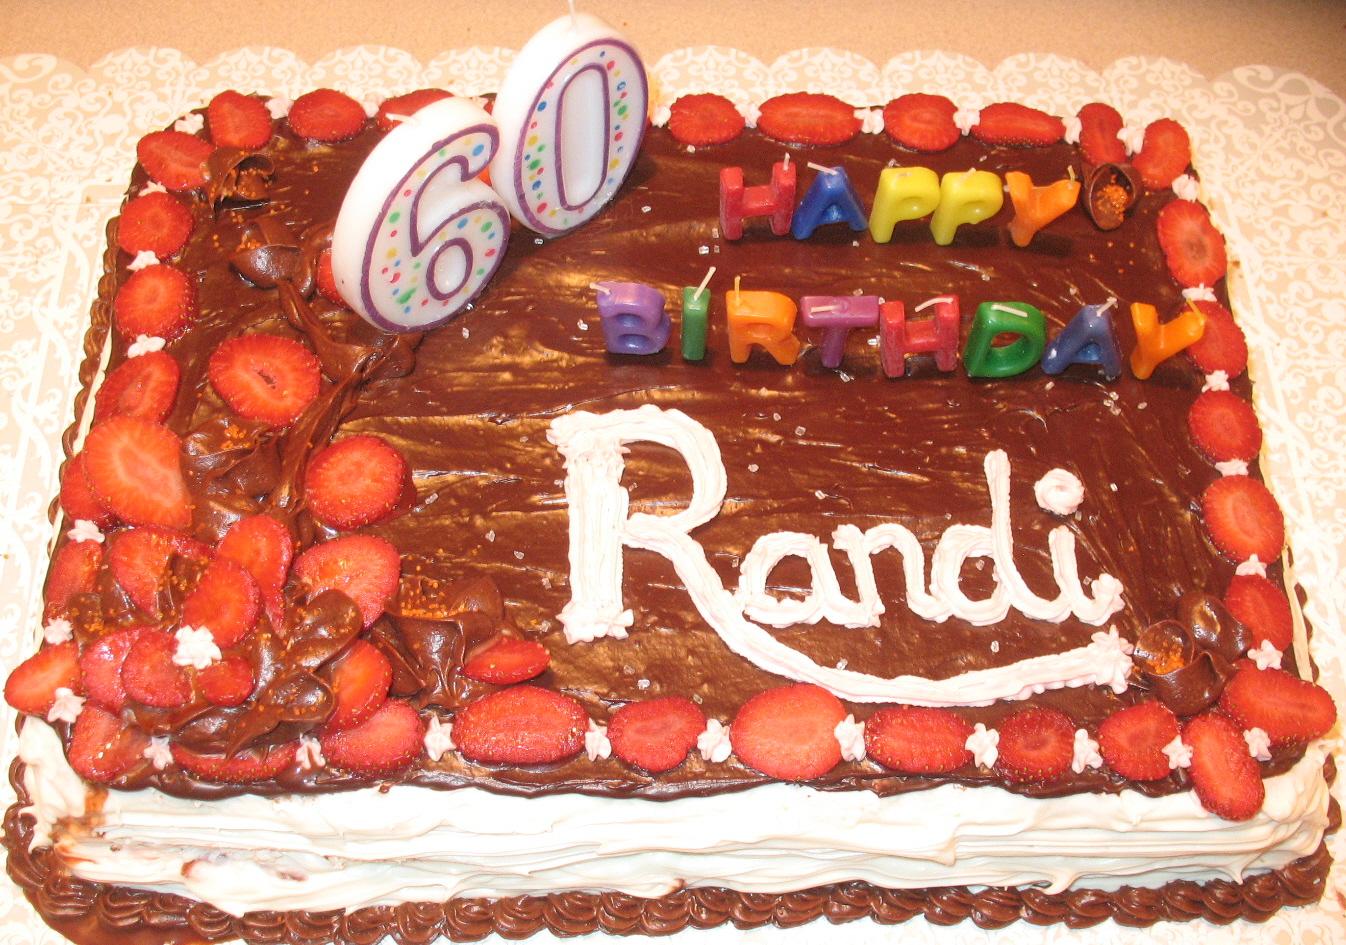 60th B'dy Cake